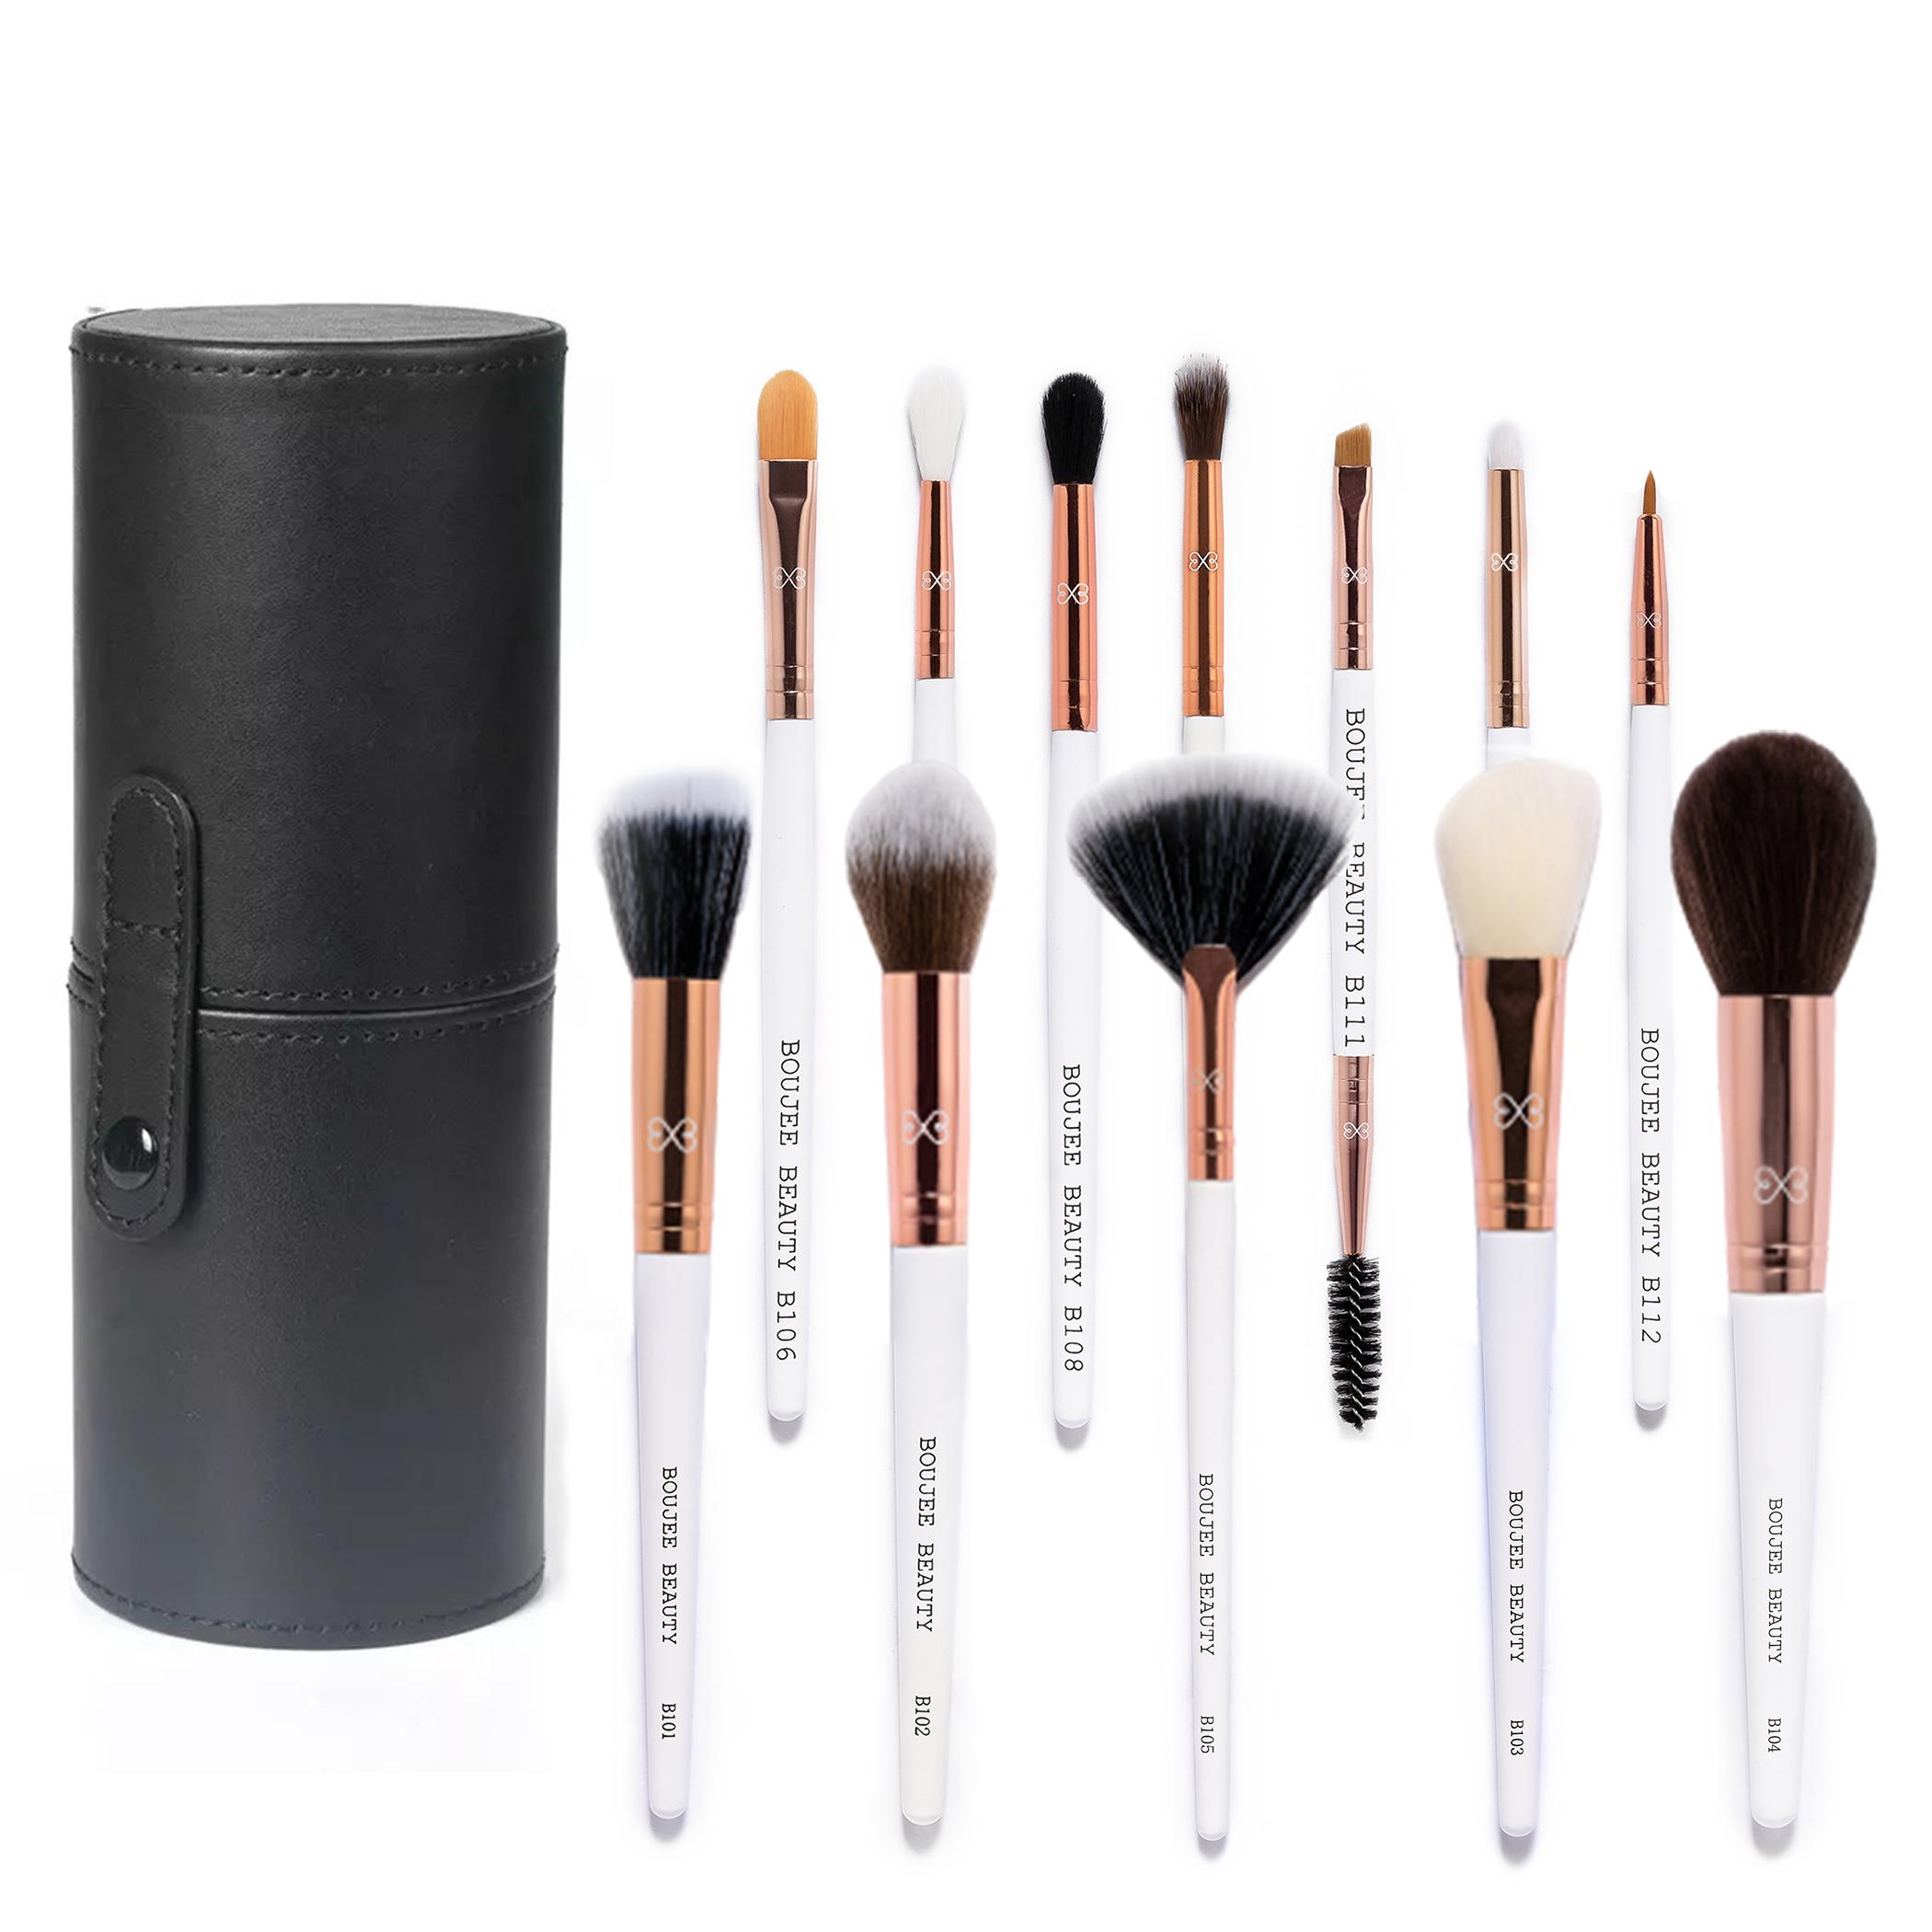 Boujee Beauty 12 Pcs. Professional Brush Set With Travel Case